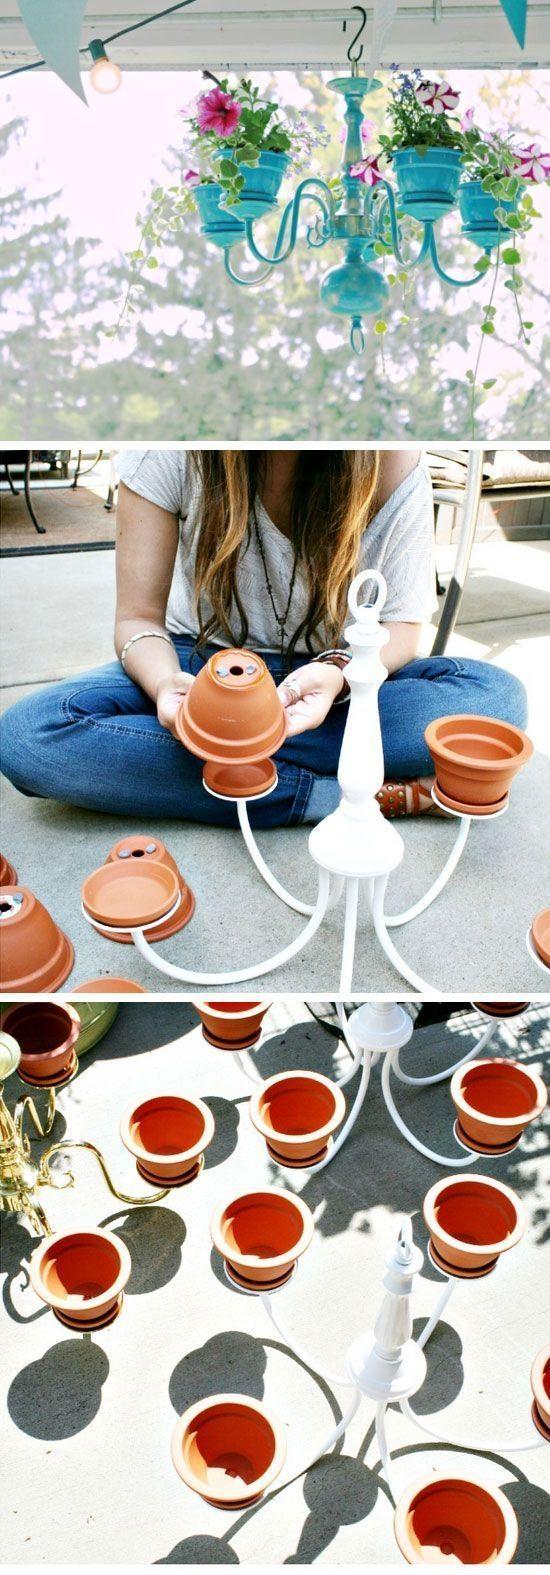 Kronleuchter Pflanzer Tutorial | DIY Gartenprojekte Ideen Hinterhöfe | DIY gard … - Diyprojectgardens.club #backpatio